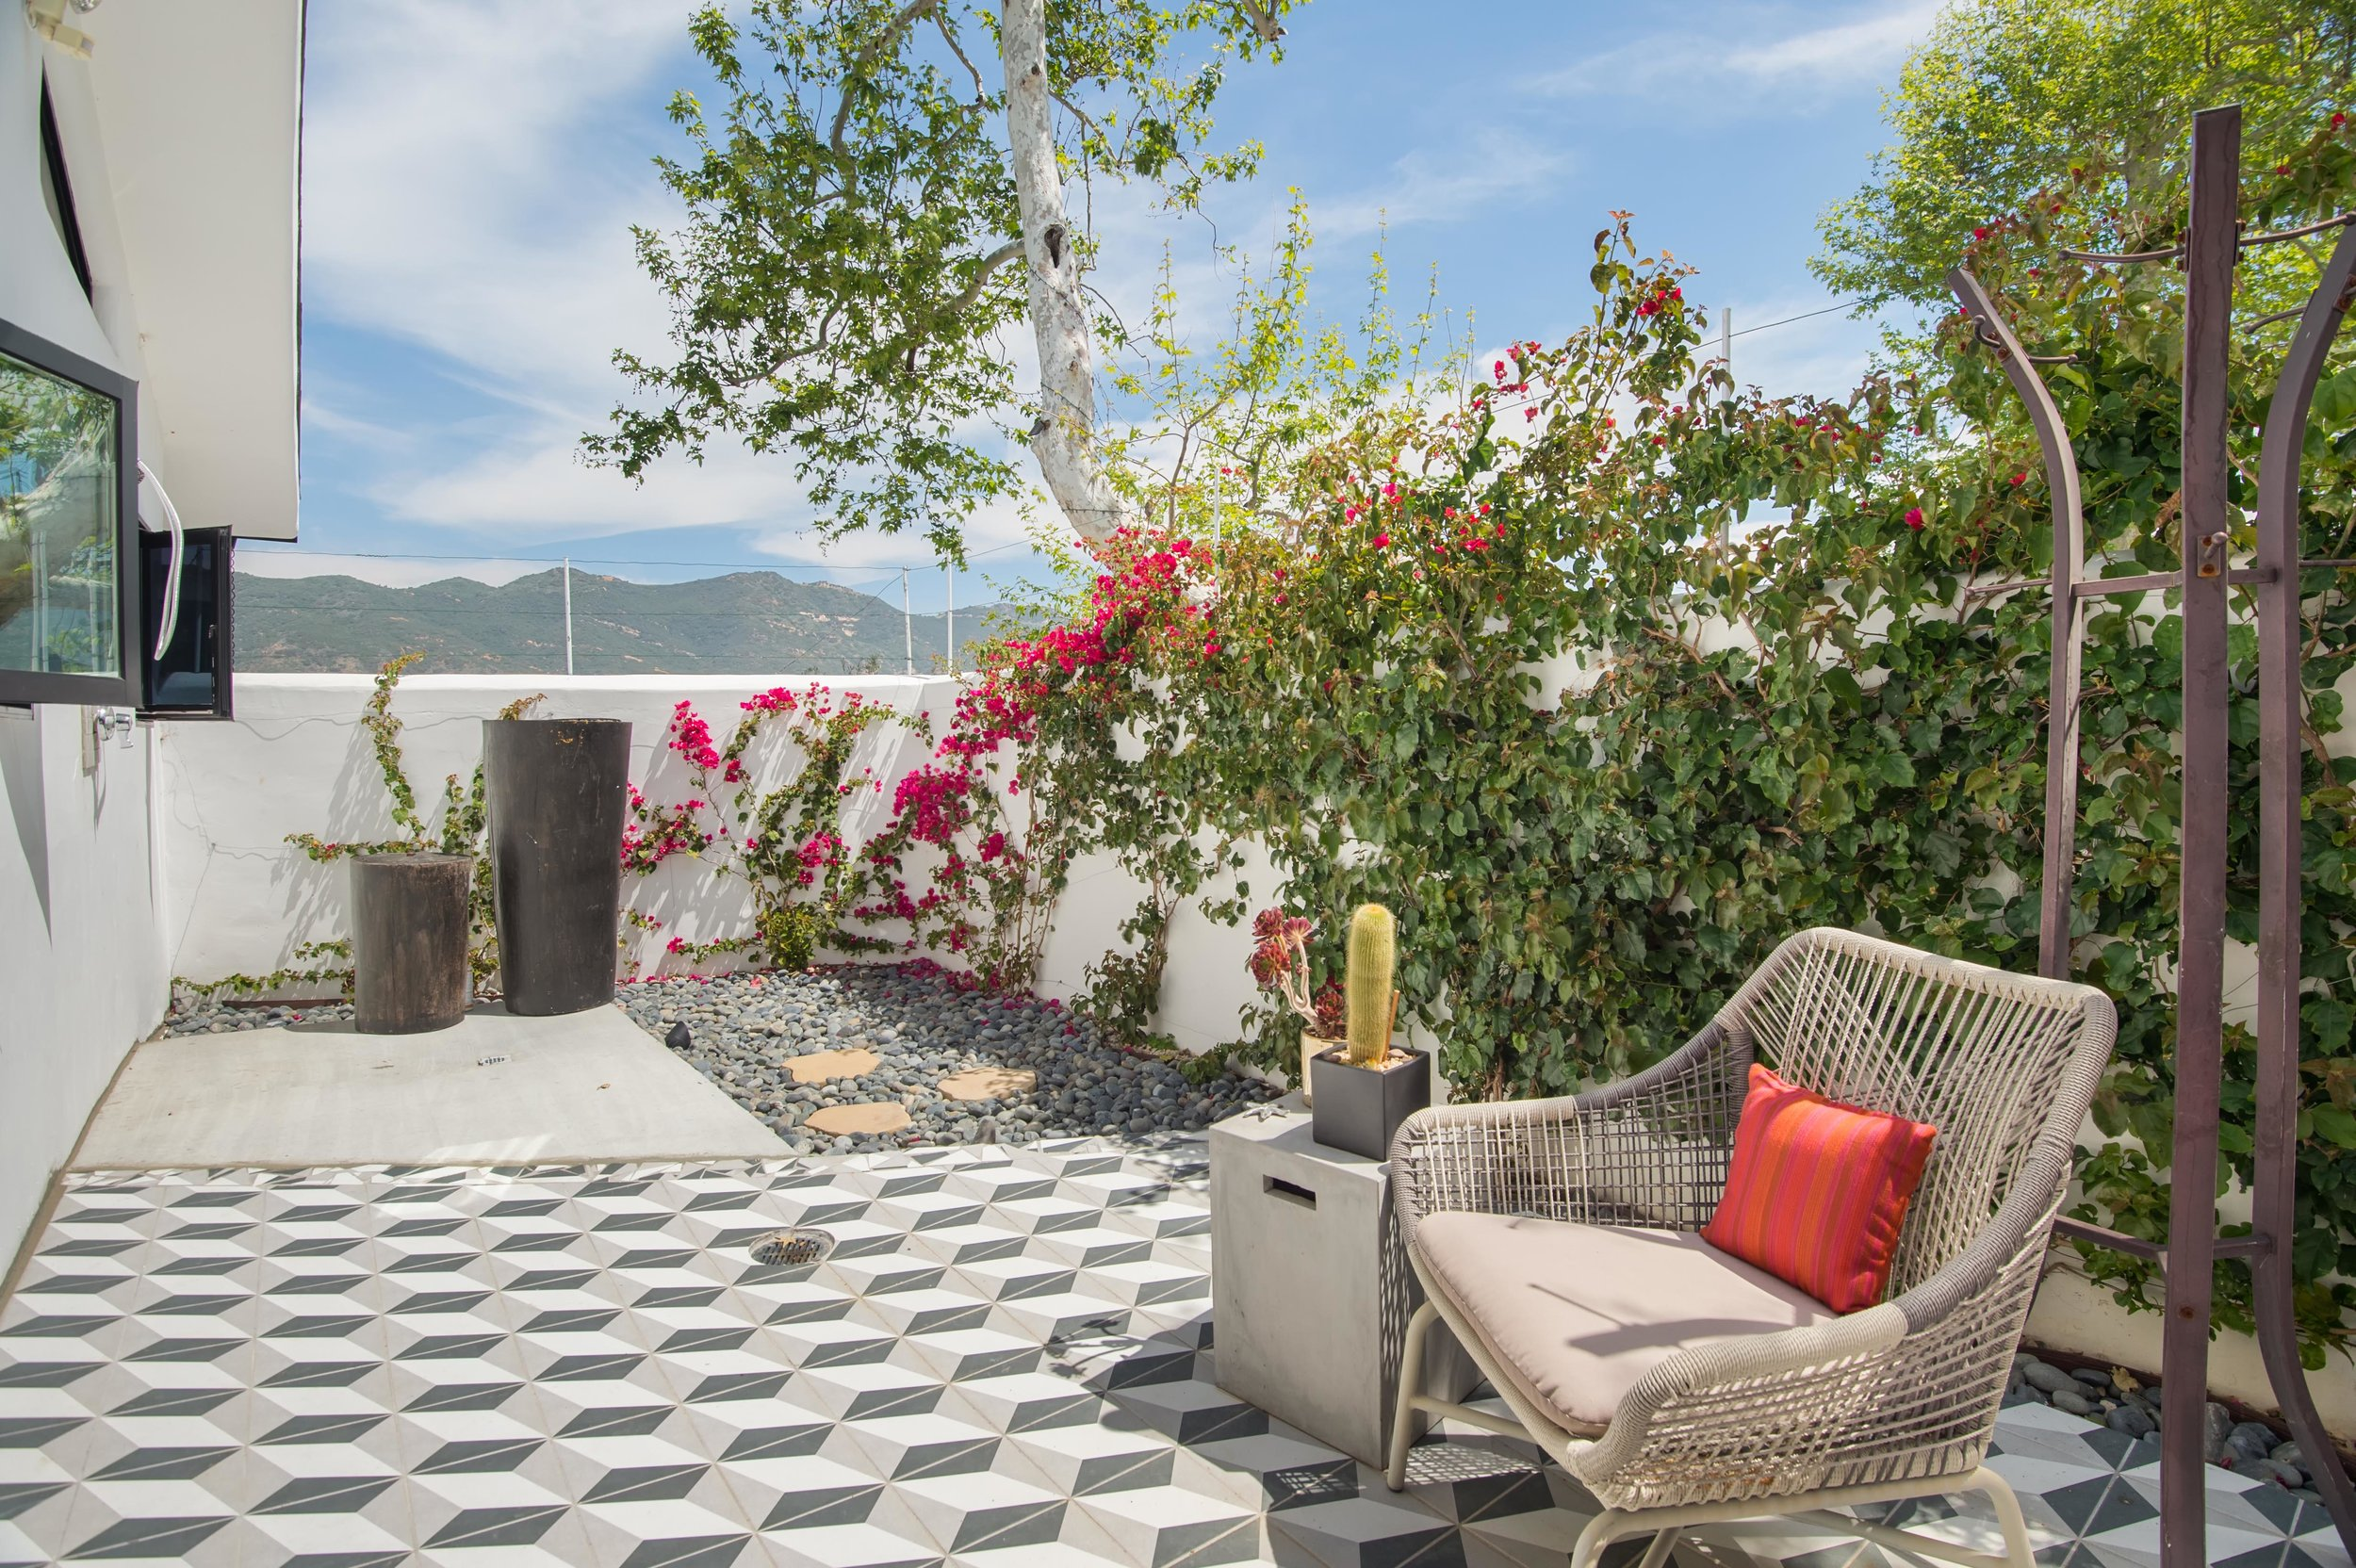 022 Patio 26272 Cool Glen Way Malibu For Sale Luxury Real Estate.jpg